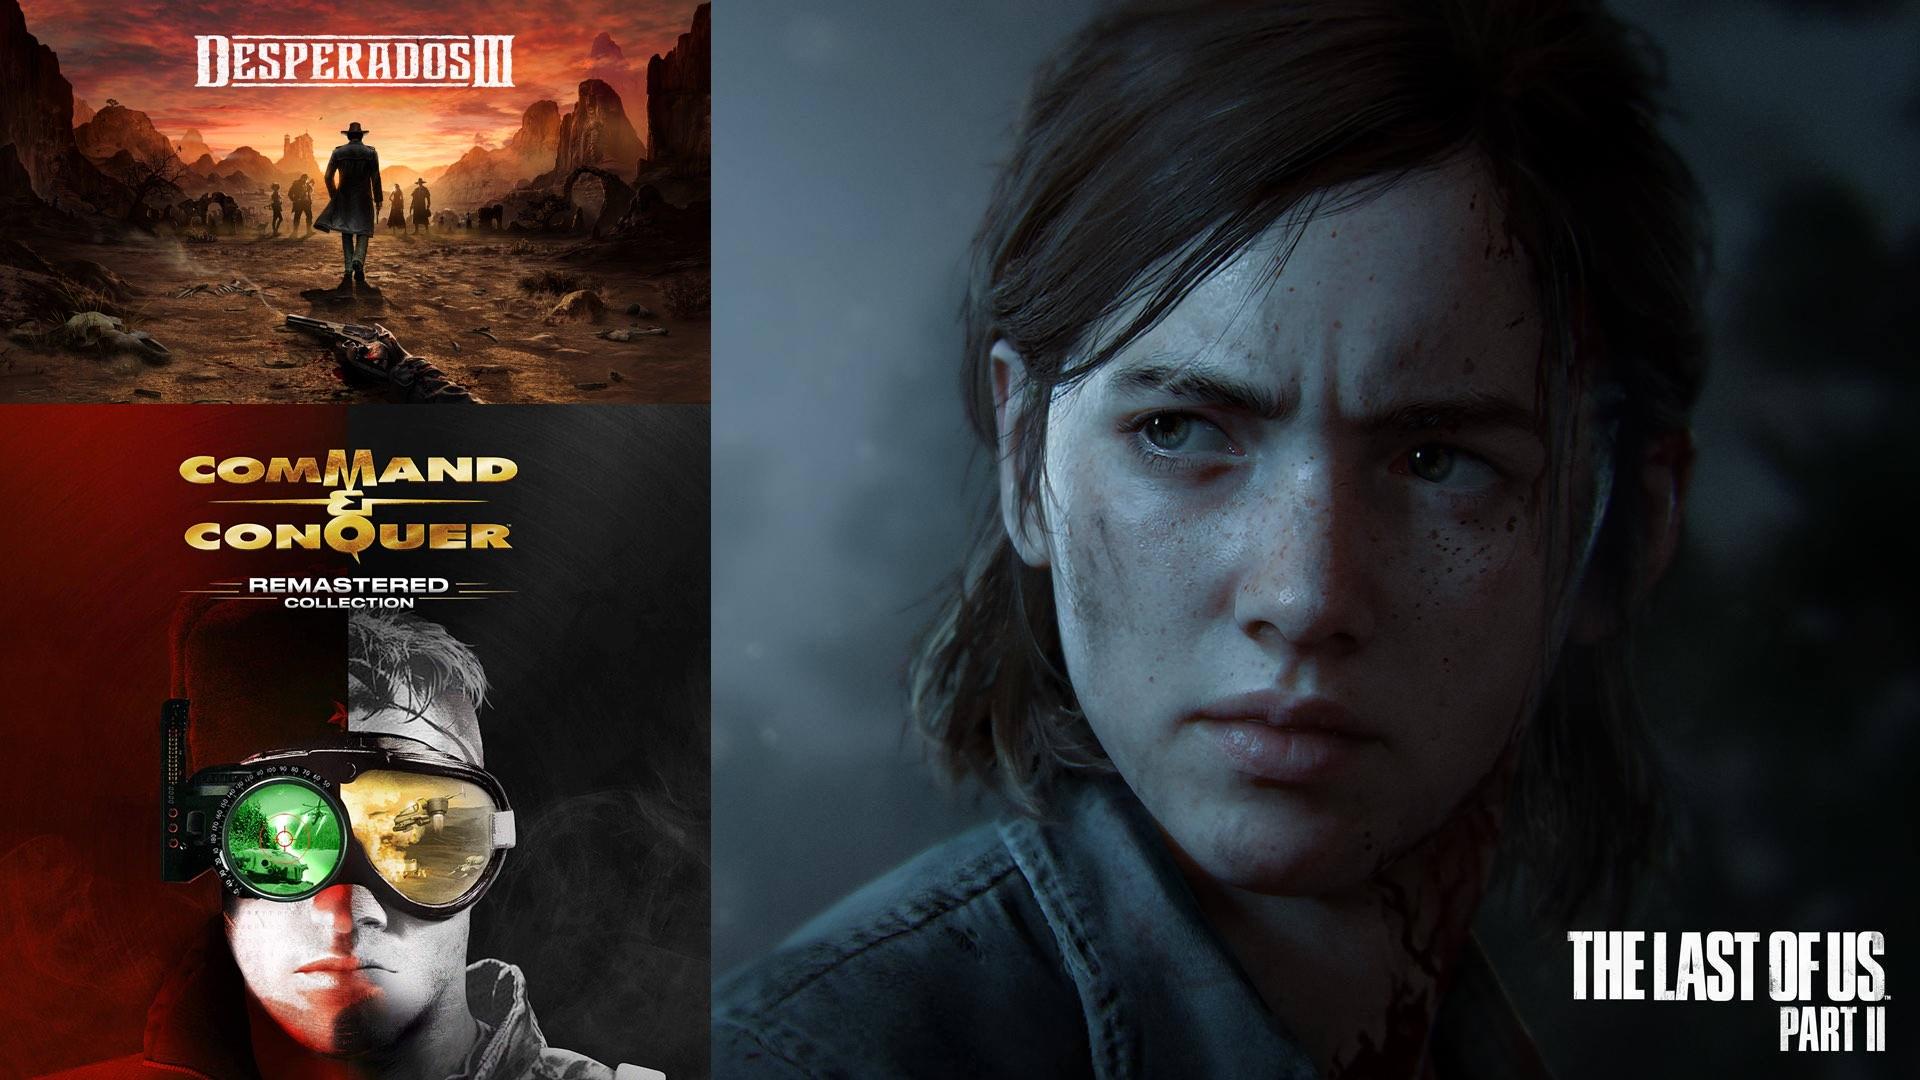 The Last of Us Part II erscheint am 19. Juni 2020.